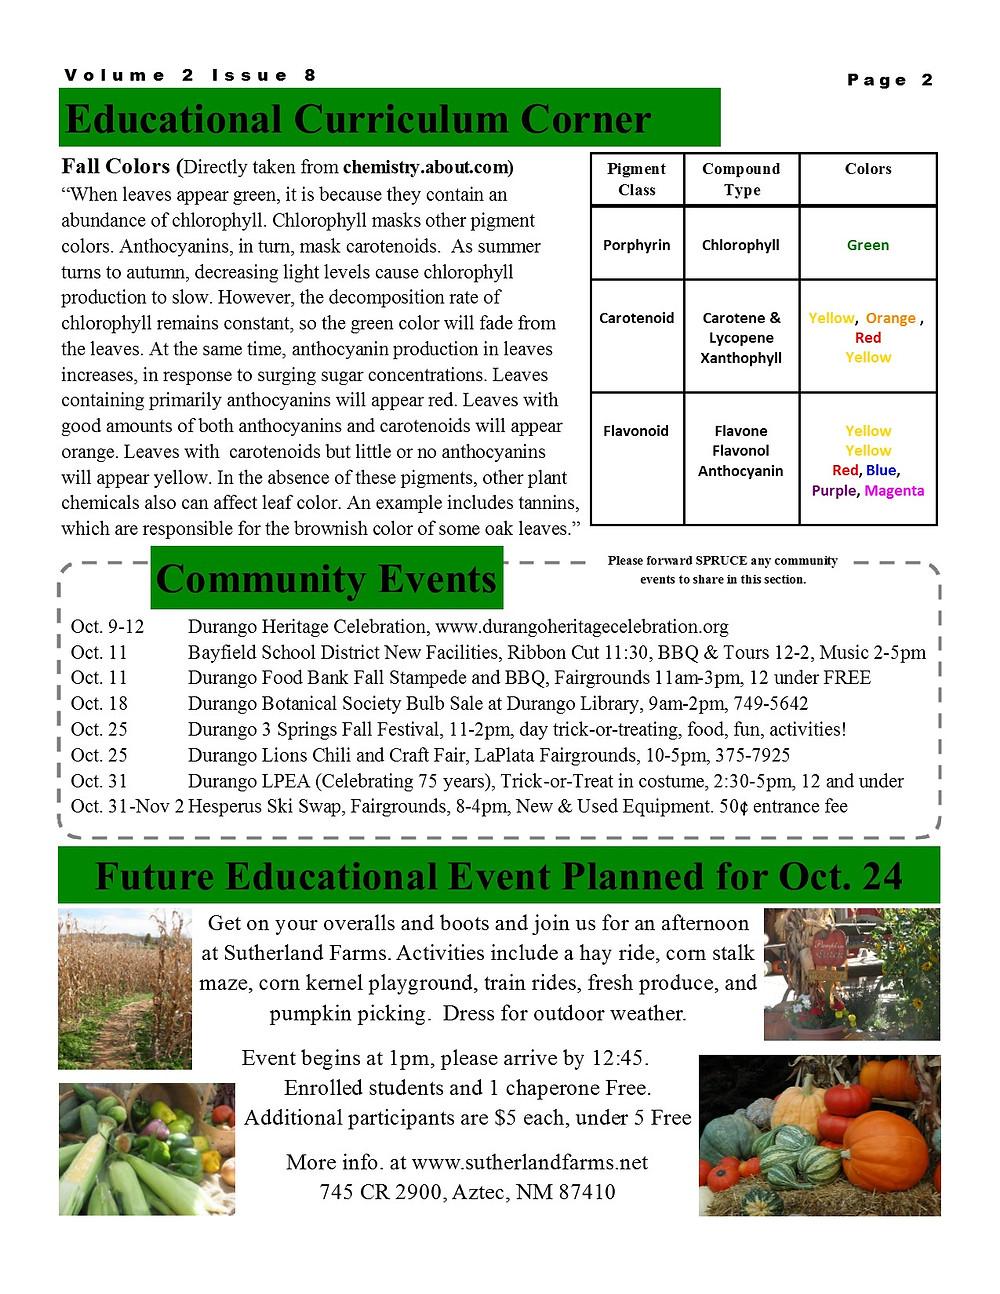 Moose Bugle 10-10-14 Page 2.jpg